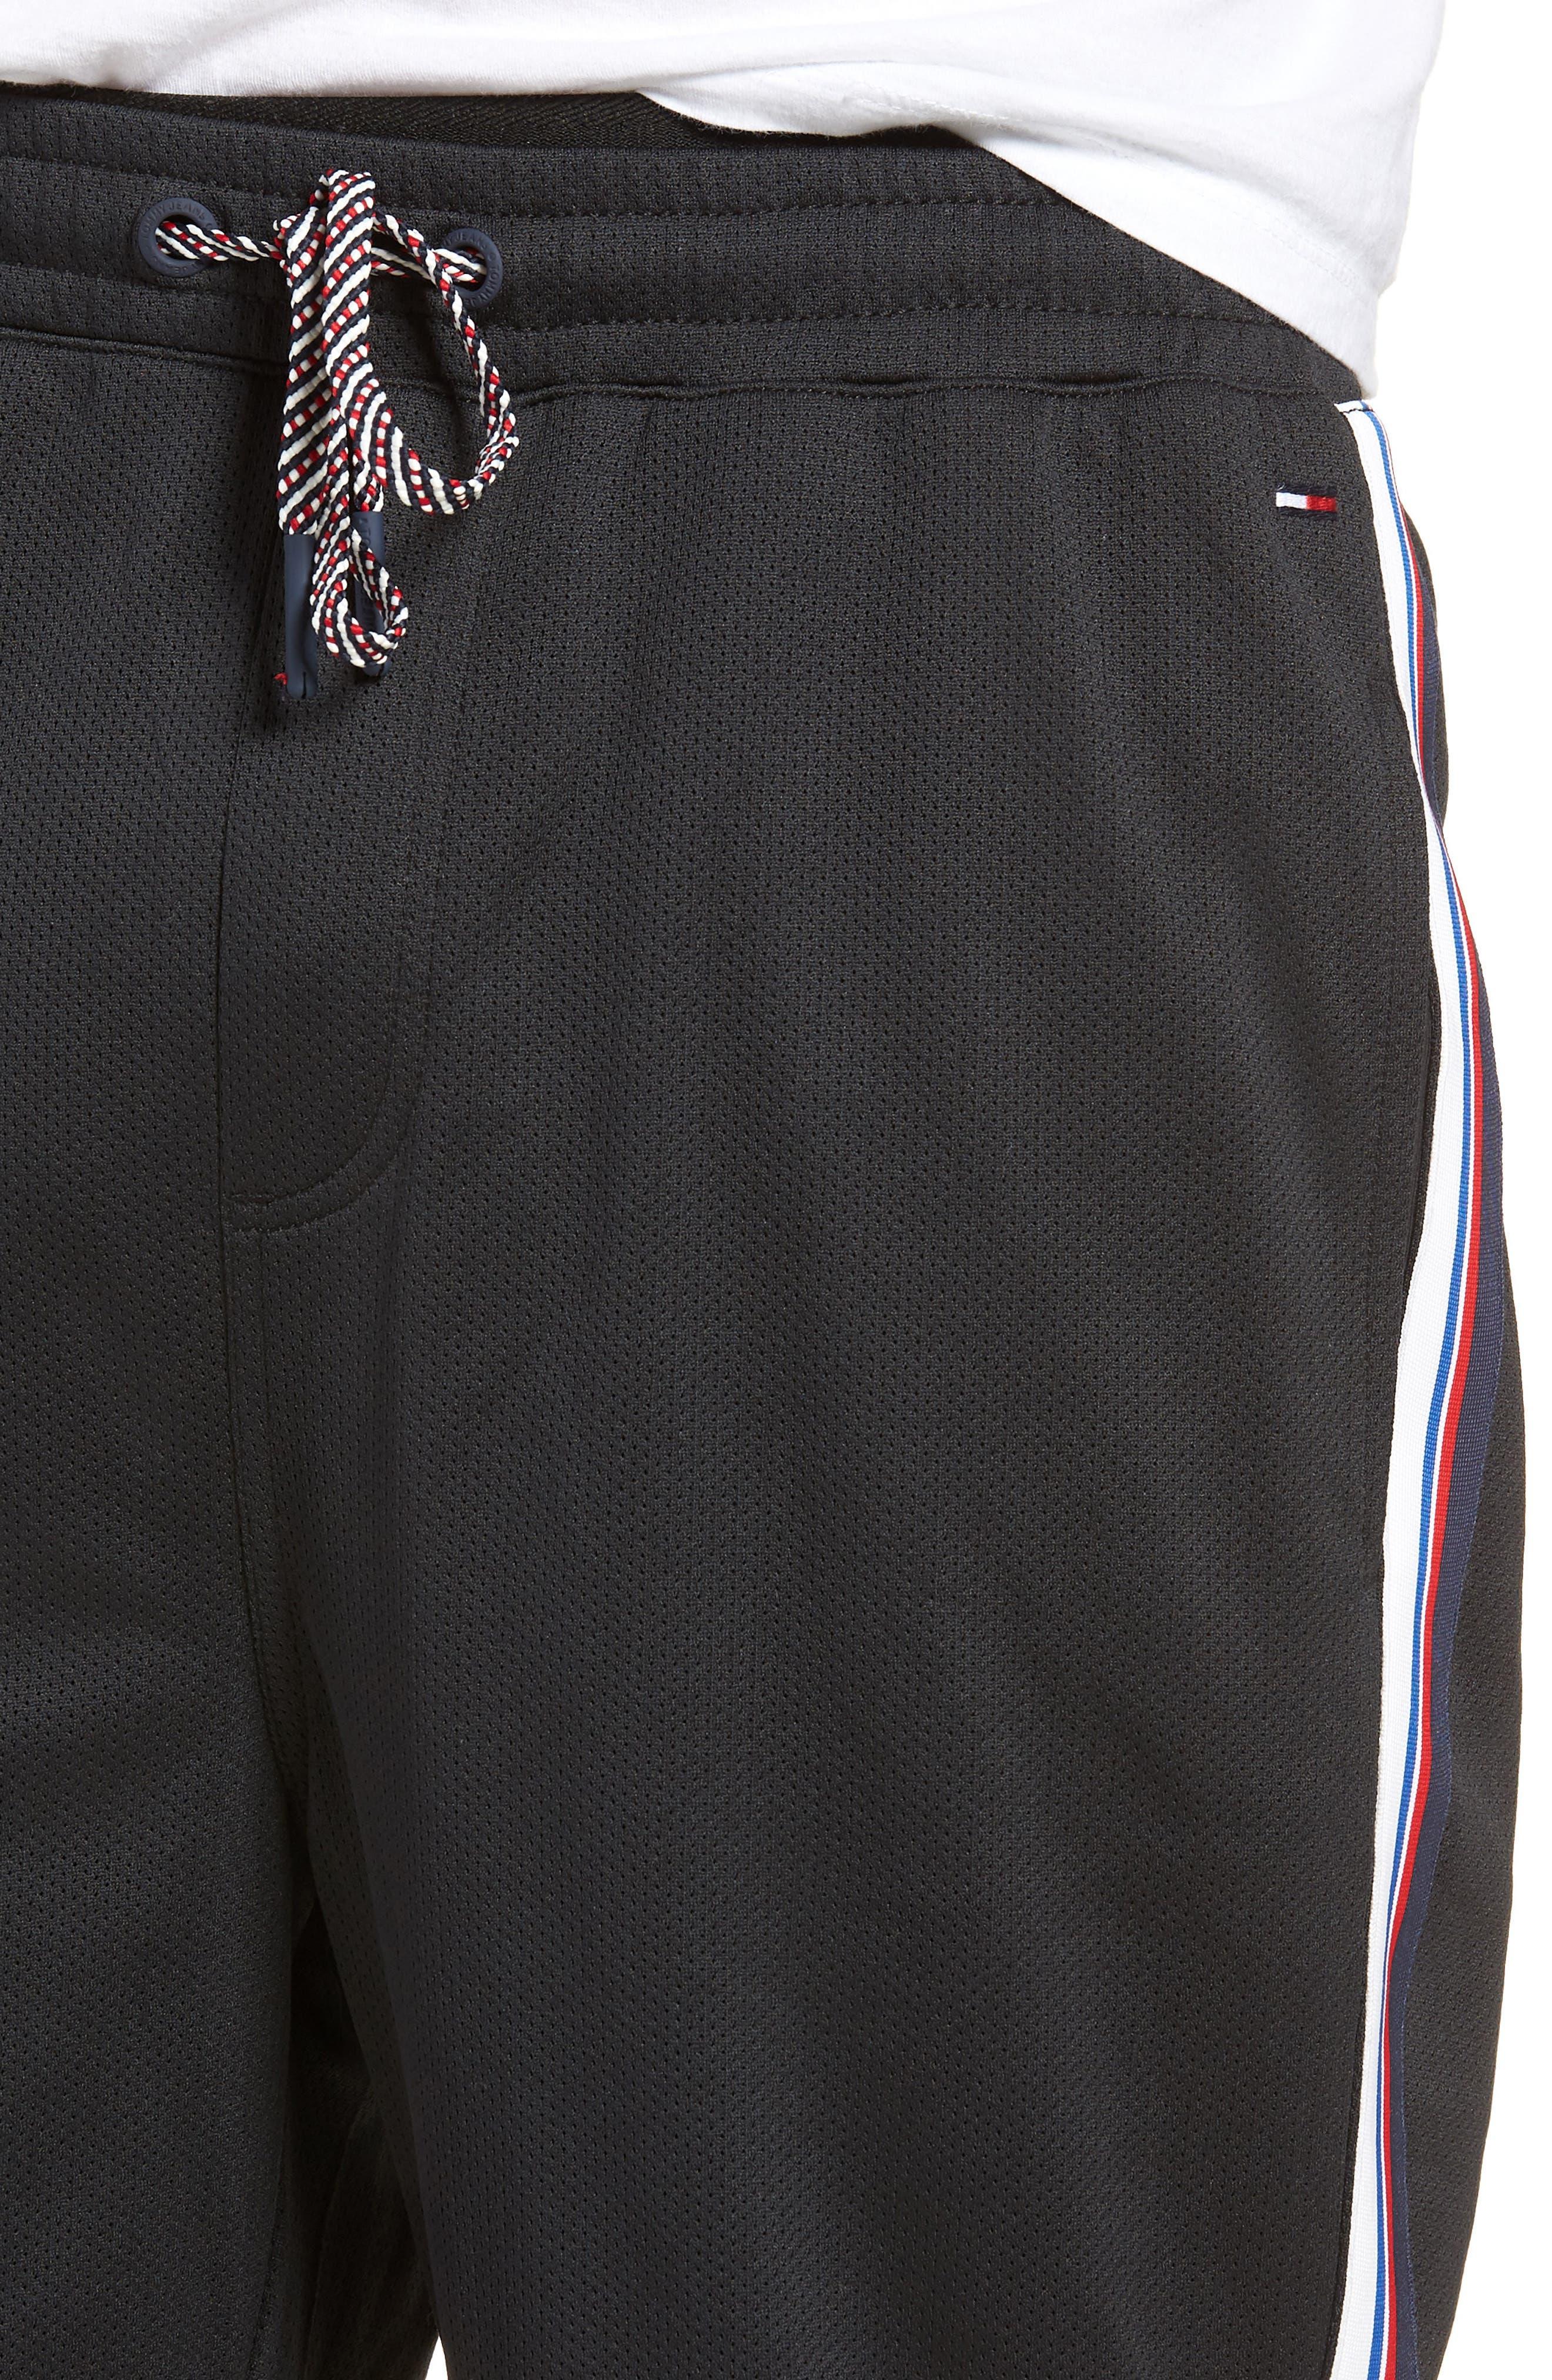 Lightweight Basketball Shorts,                             Alternate thumbnail 4, color,                             Tommy Black